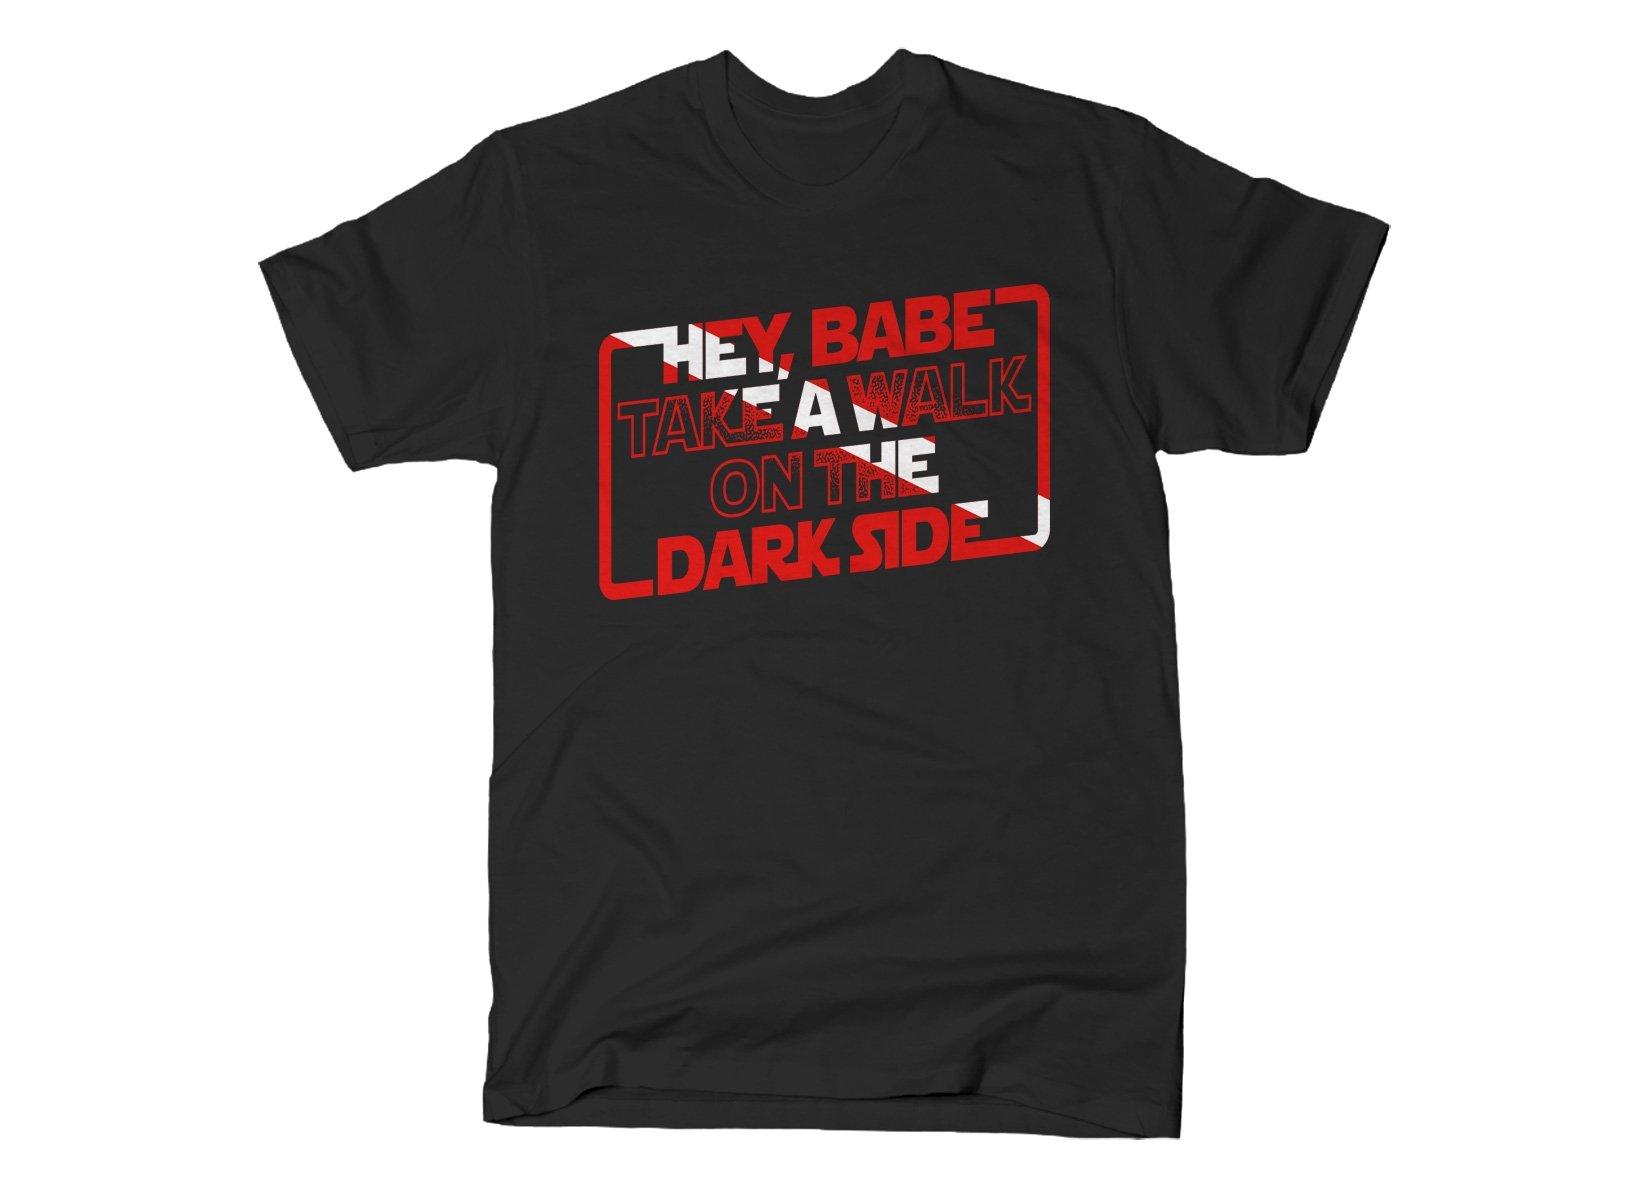 Take A Walk On The Dark Side on Mens T-Shirt